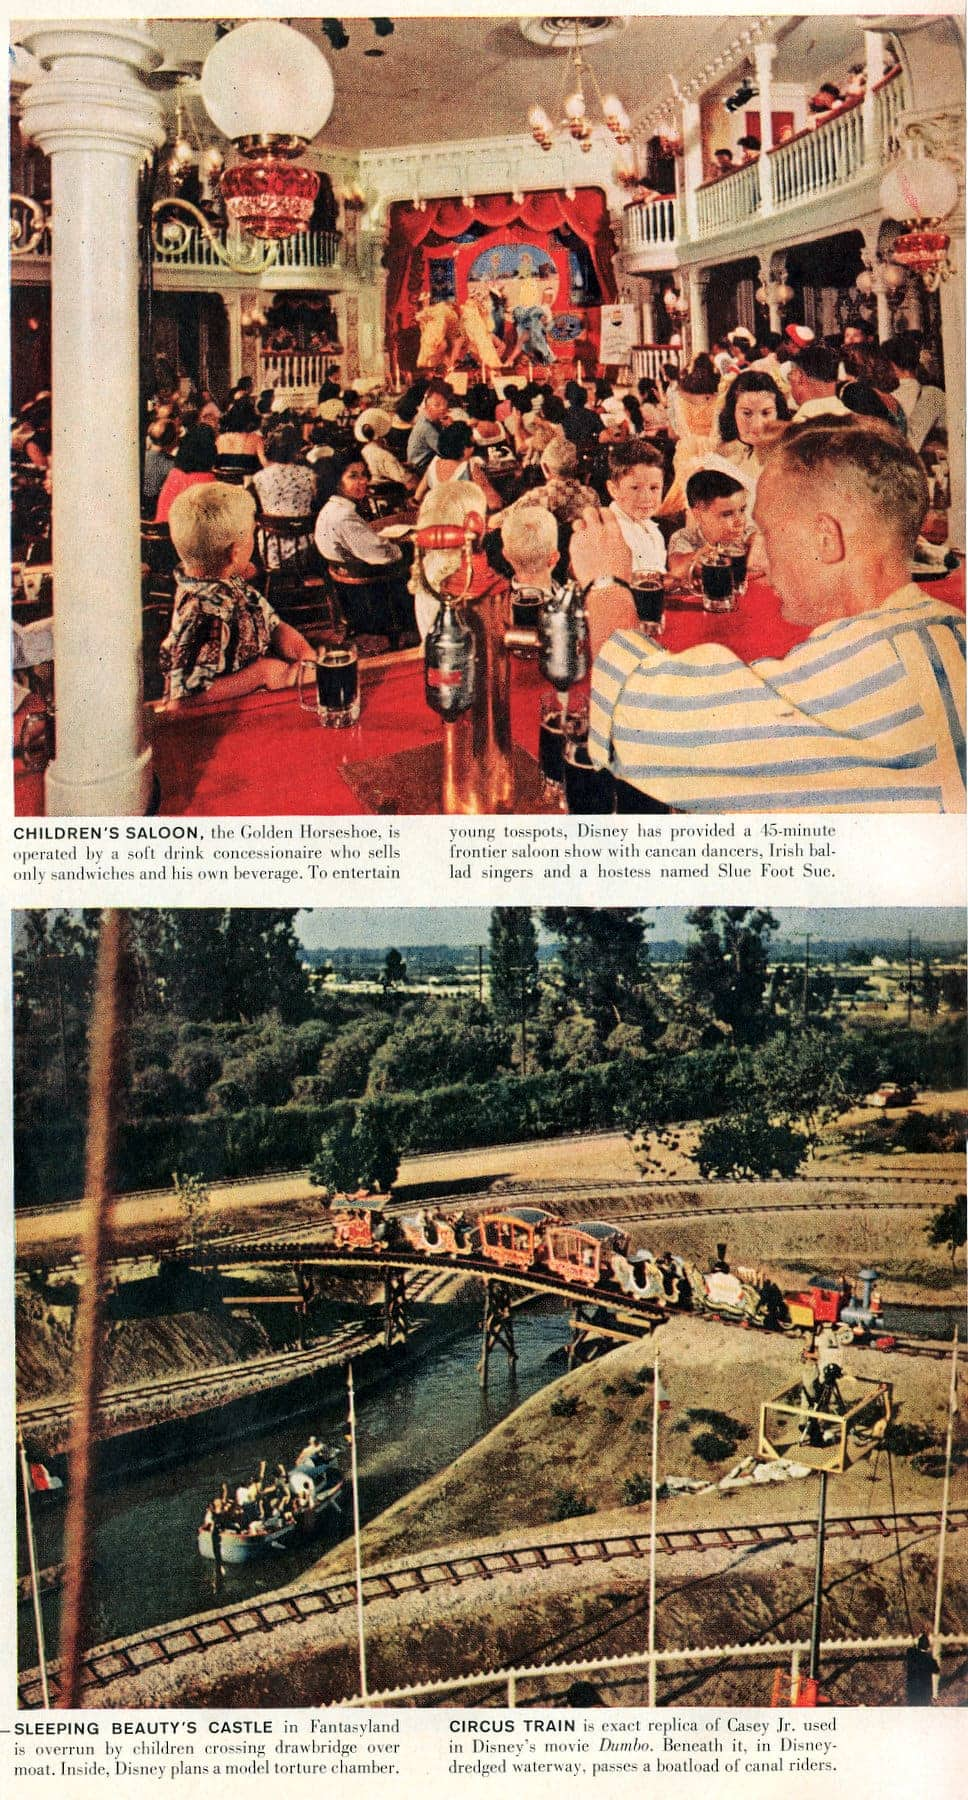 Disneyland opens - Walt Disney's magical new theme park in Southern California 1955 (4)